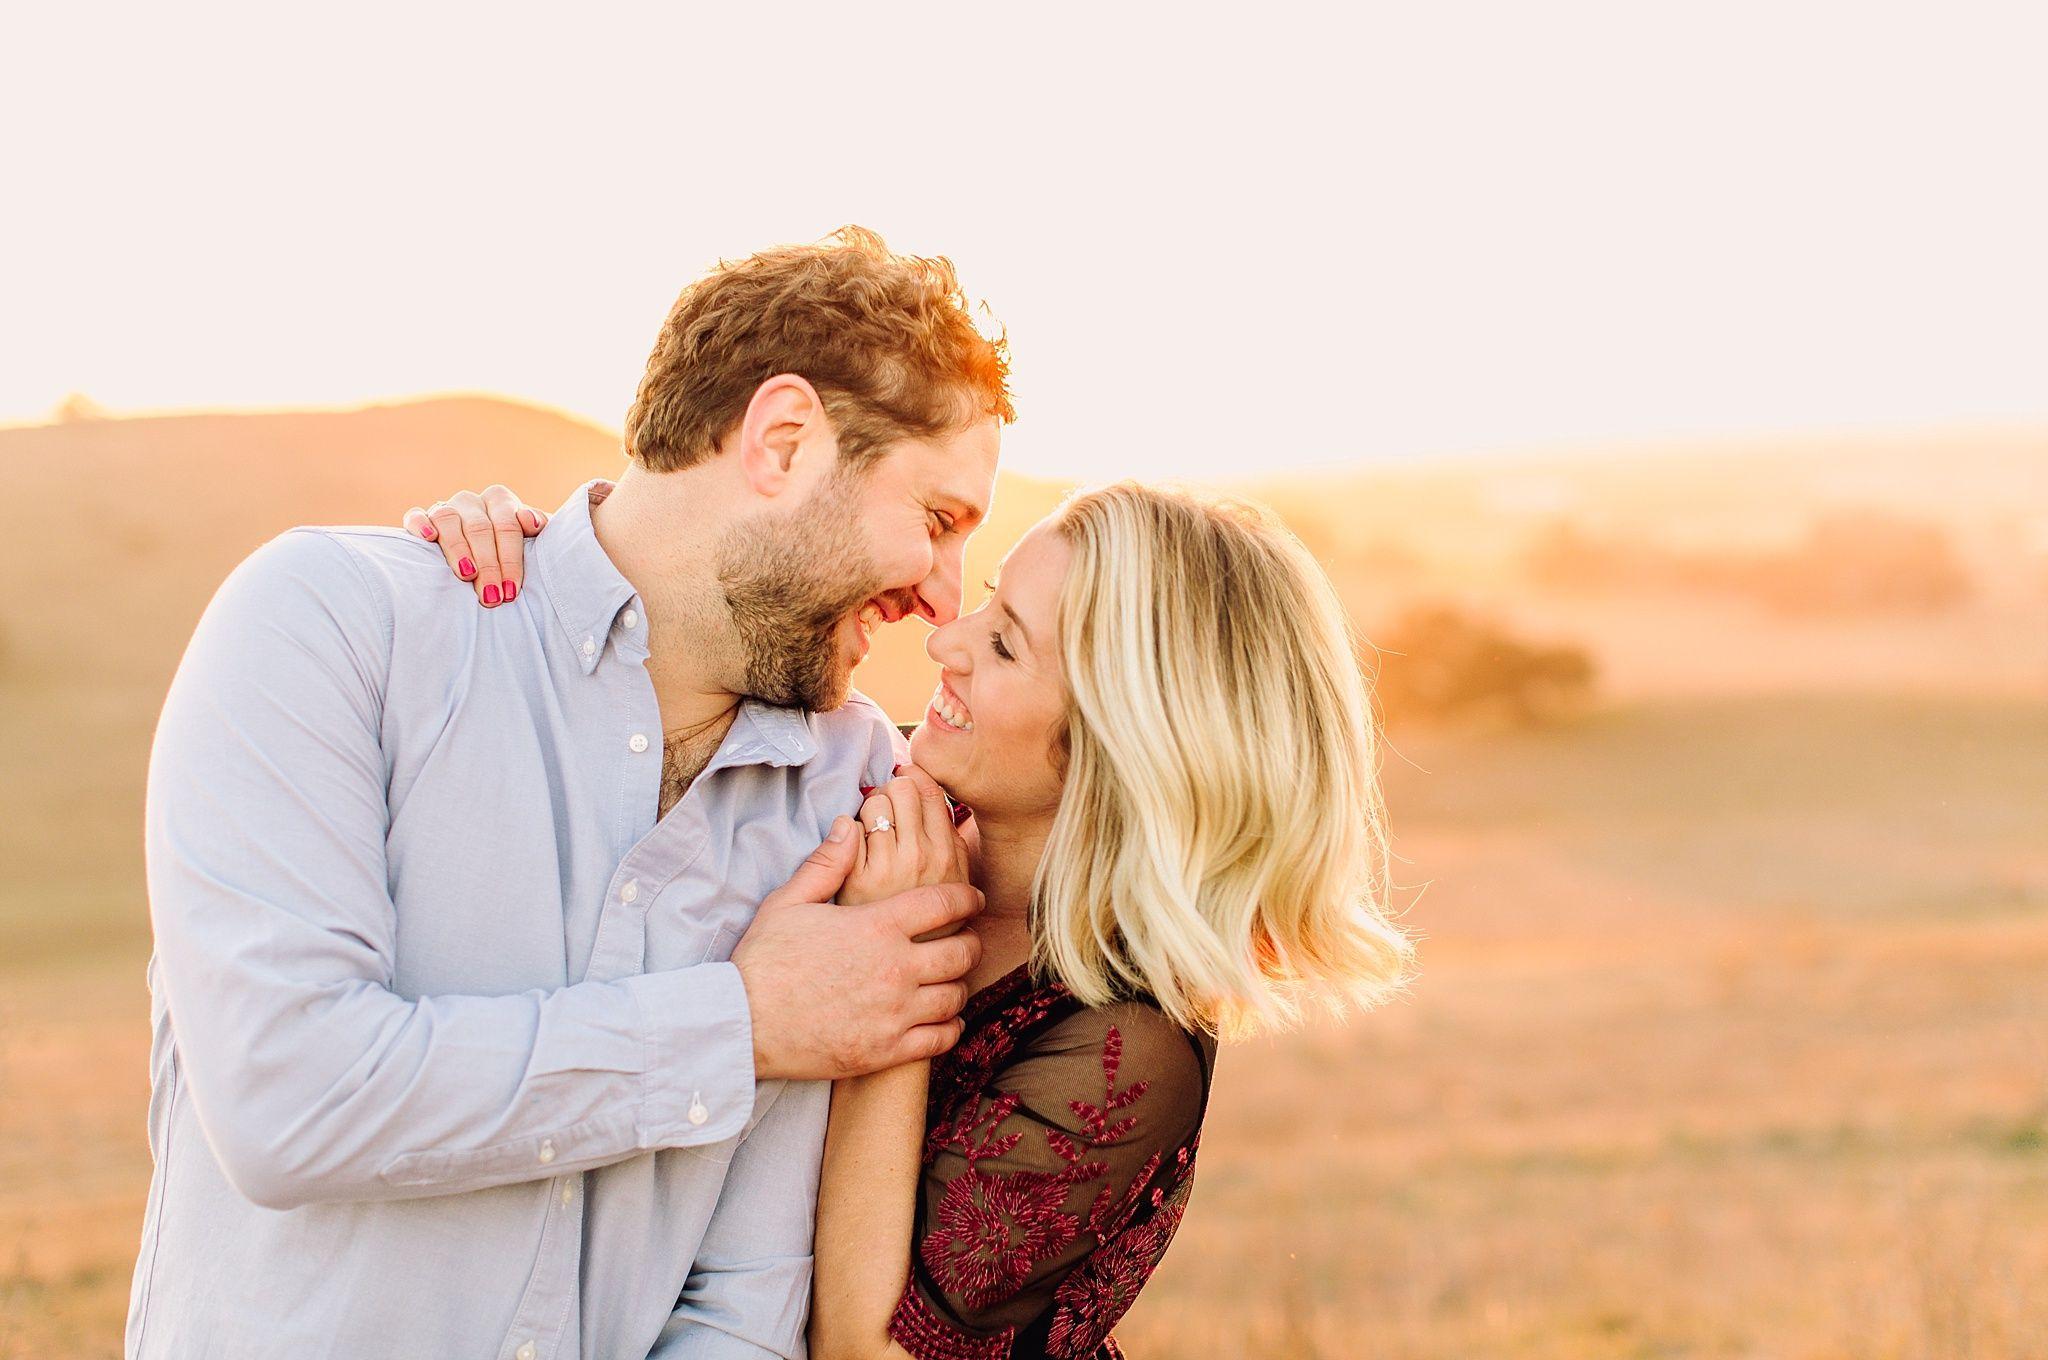 Healdsburg dating matchmaking Wichita KS